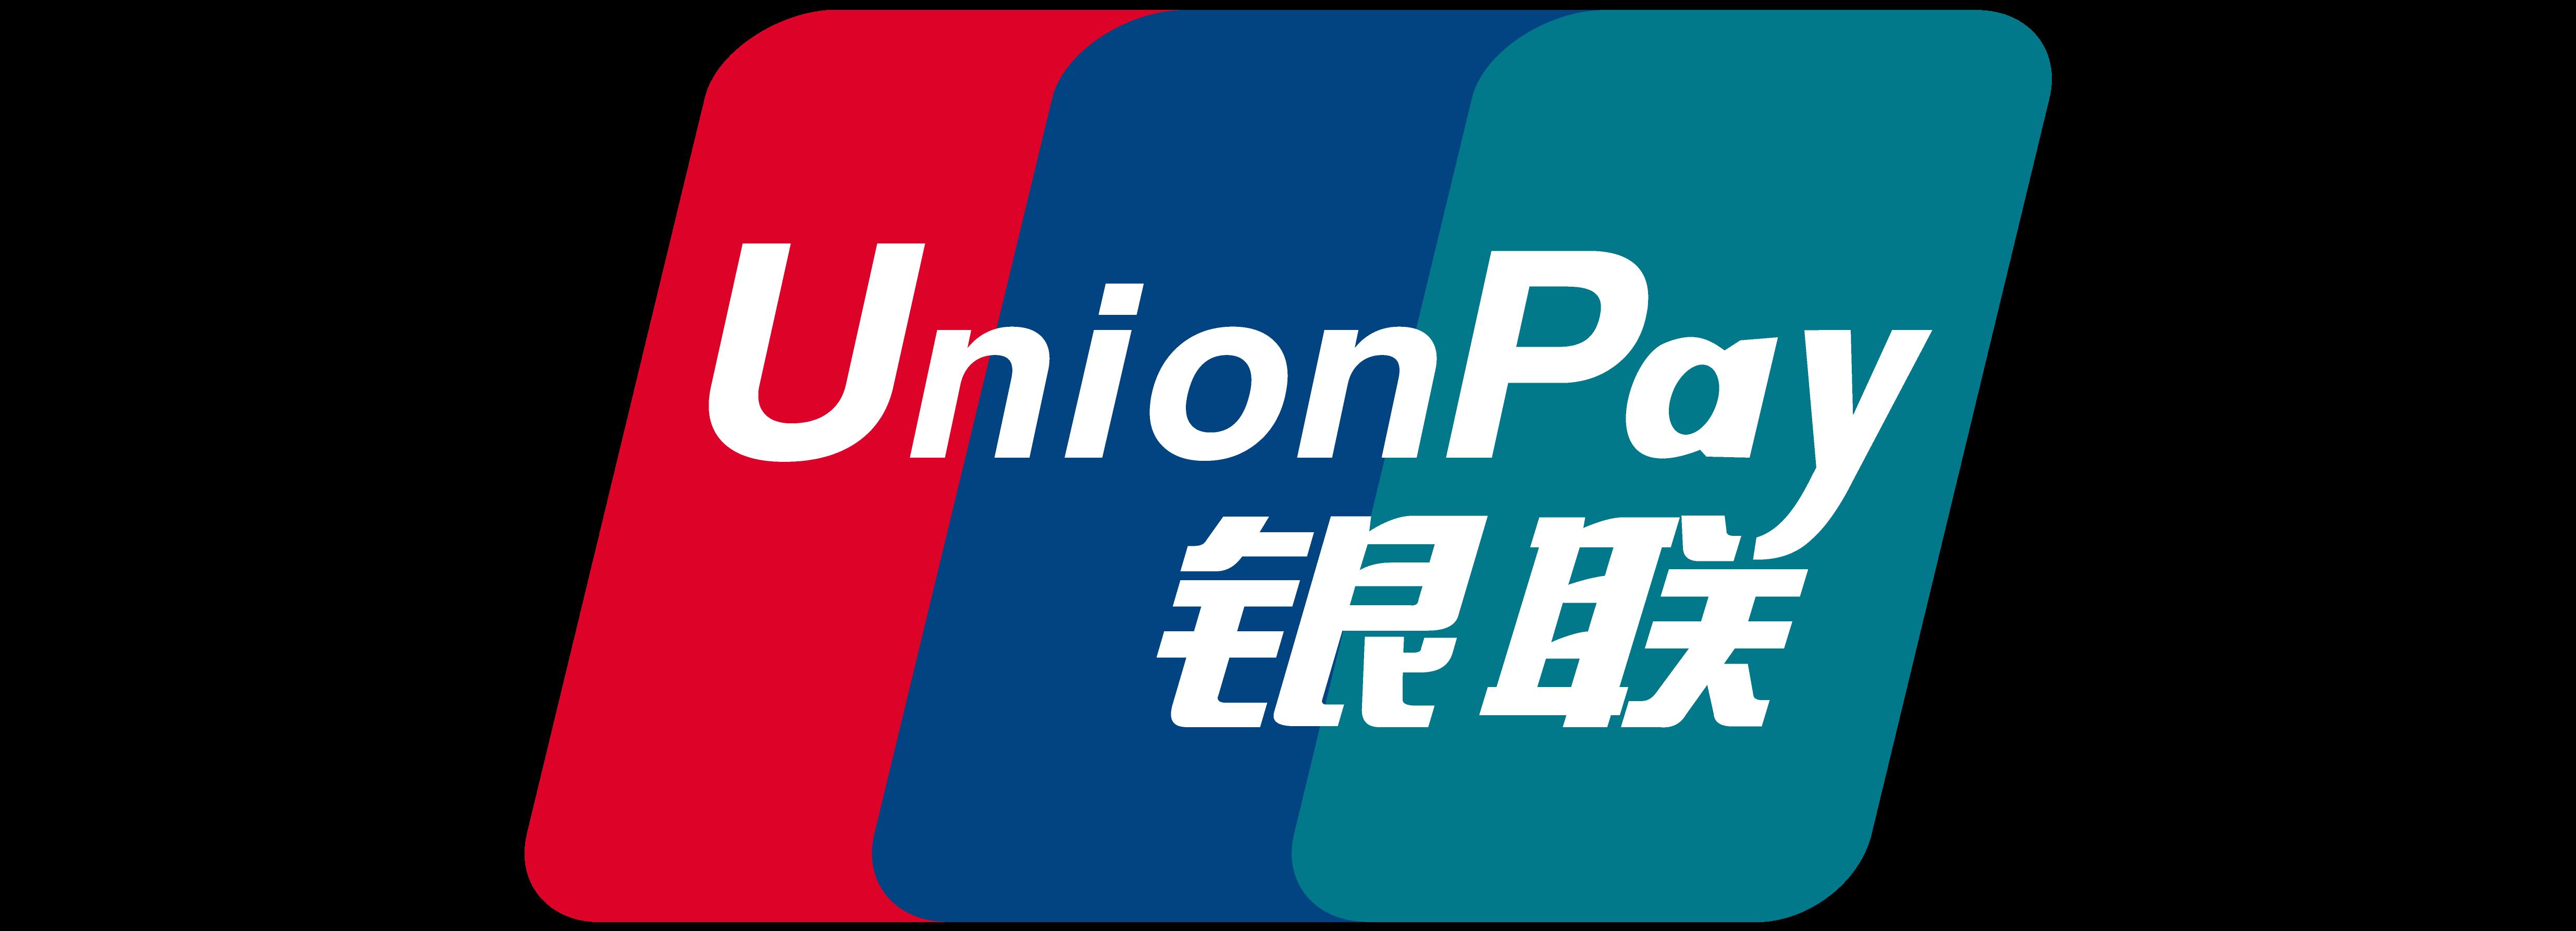 Amana Payment Options - UnionPay